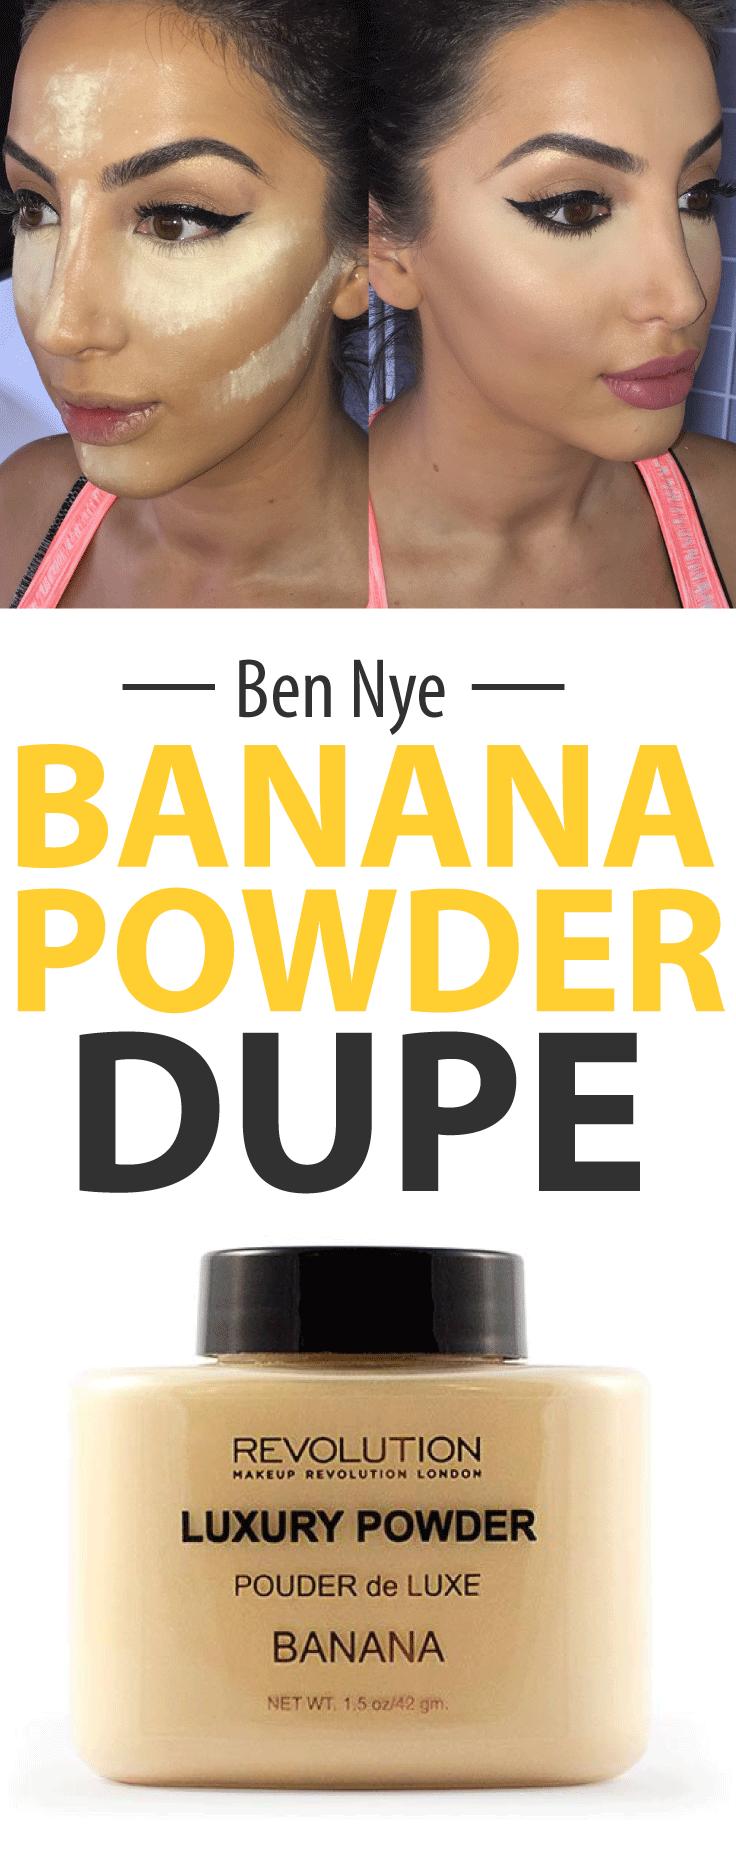 Makeup Revolution Luxury Banana Powder £5 Delivered